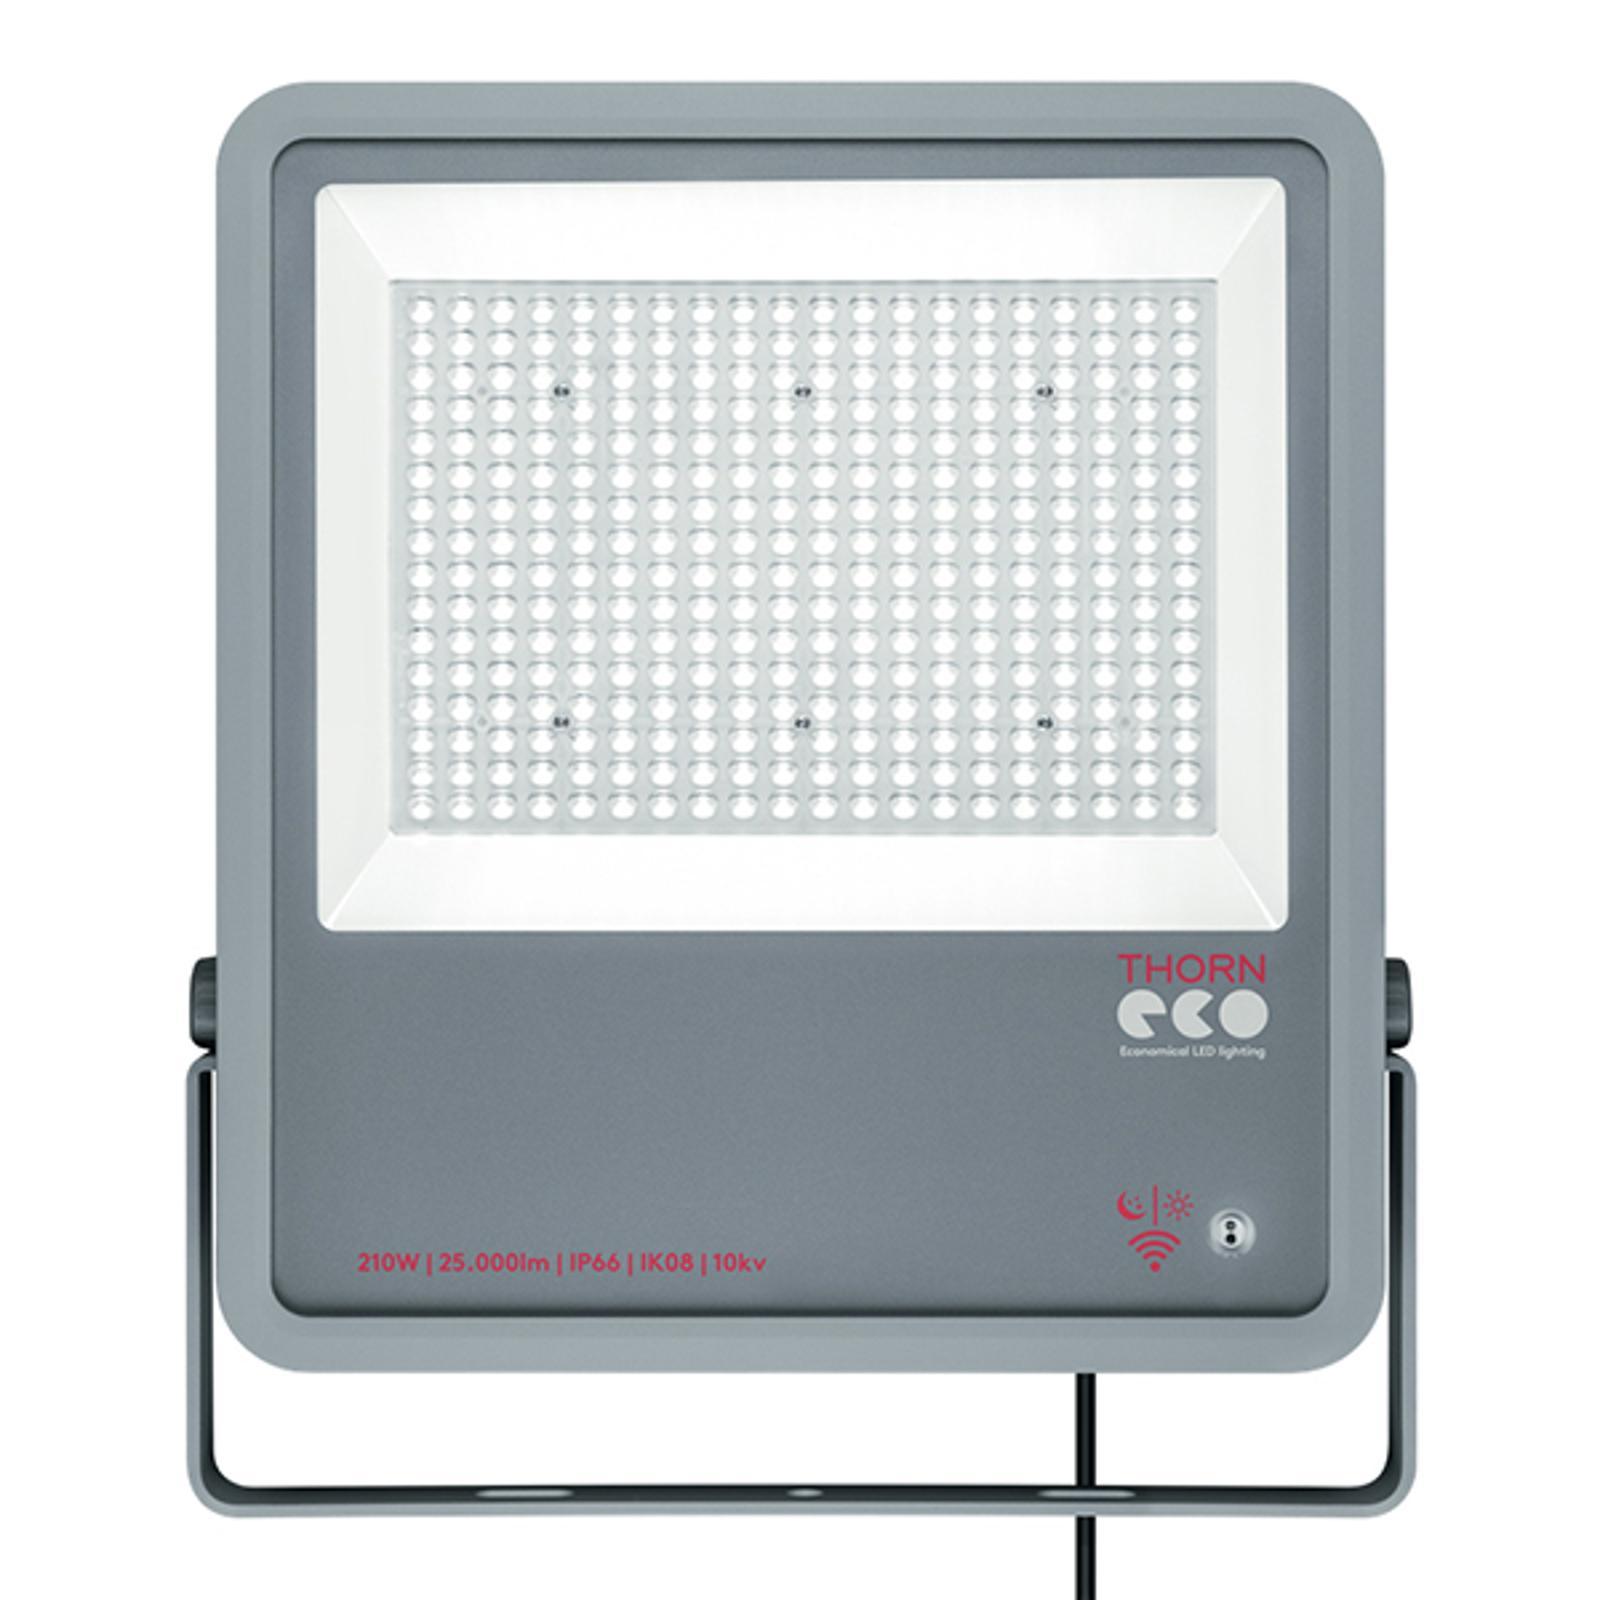 THORNeco Leo LED-Strahler IP66 210W PC 4.000 K